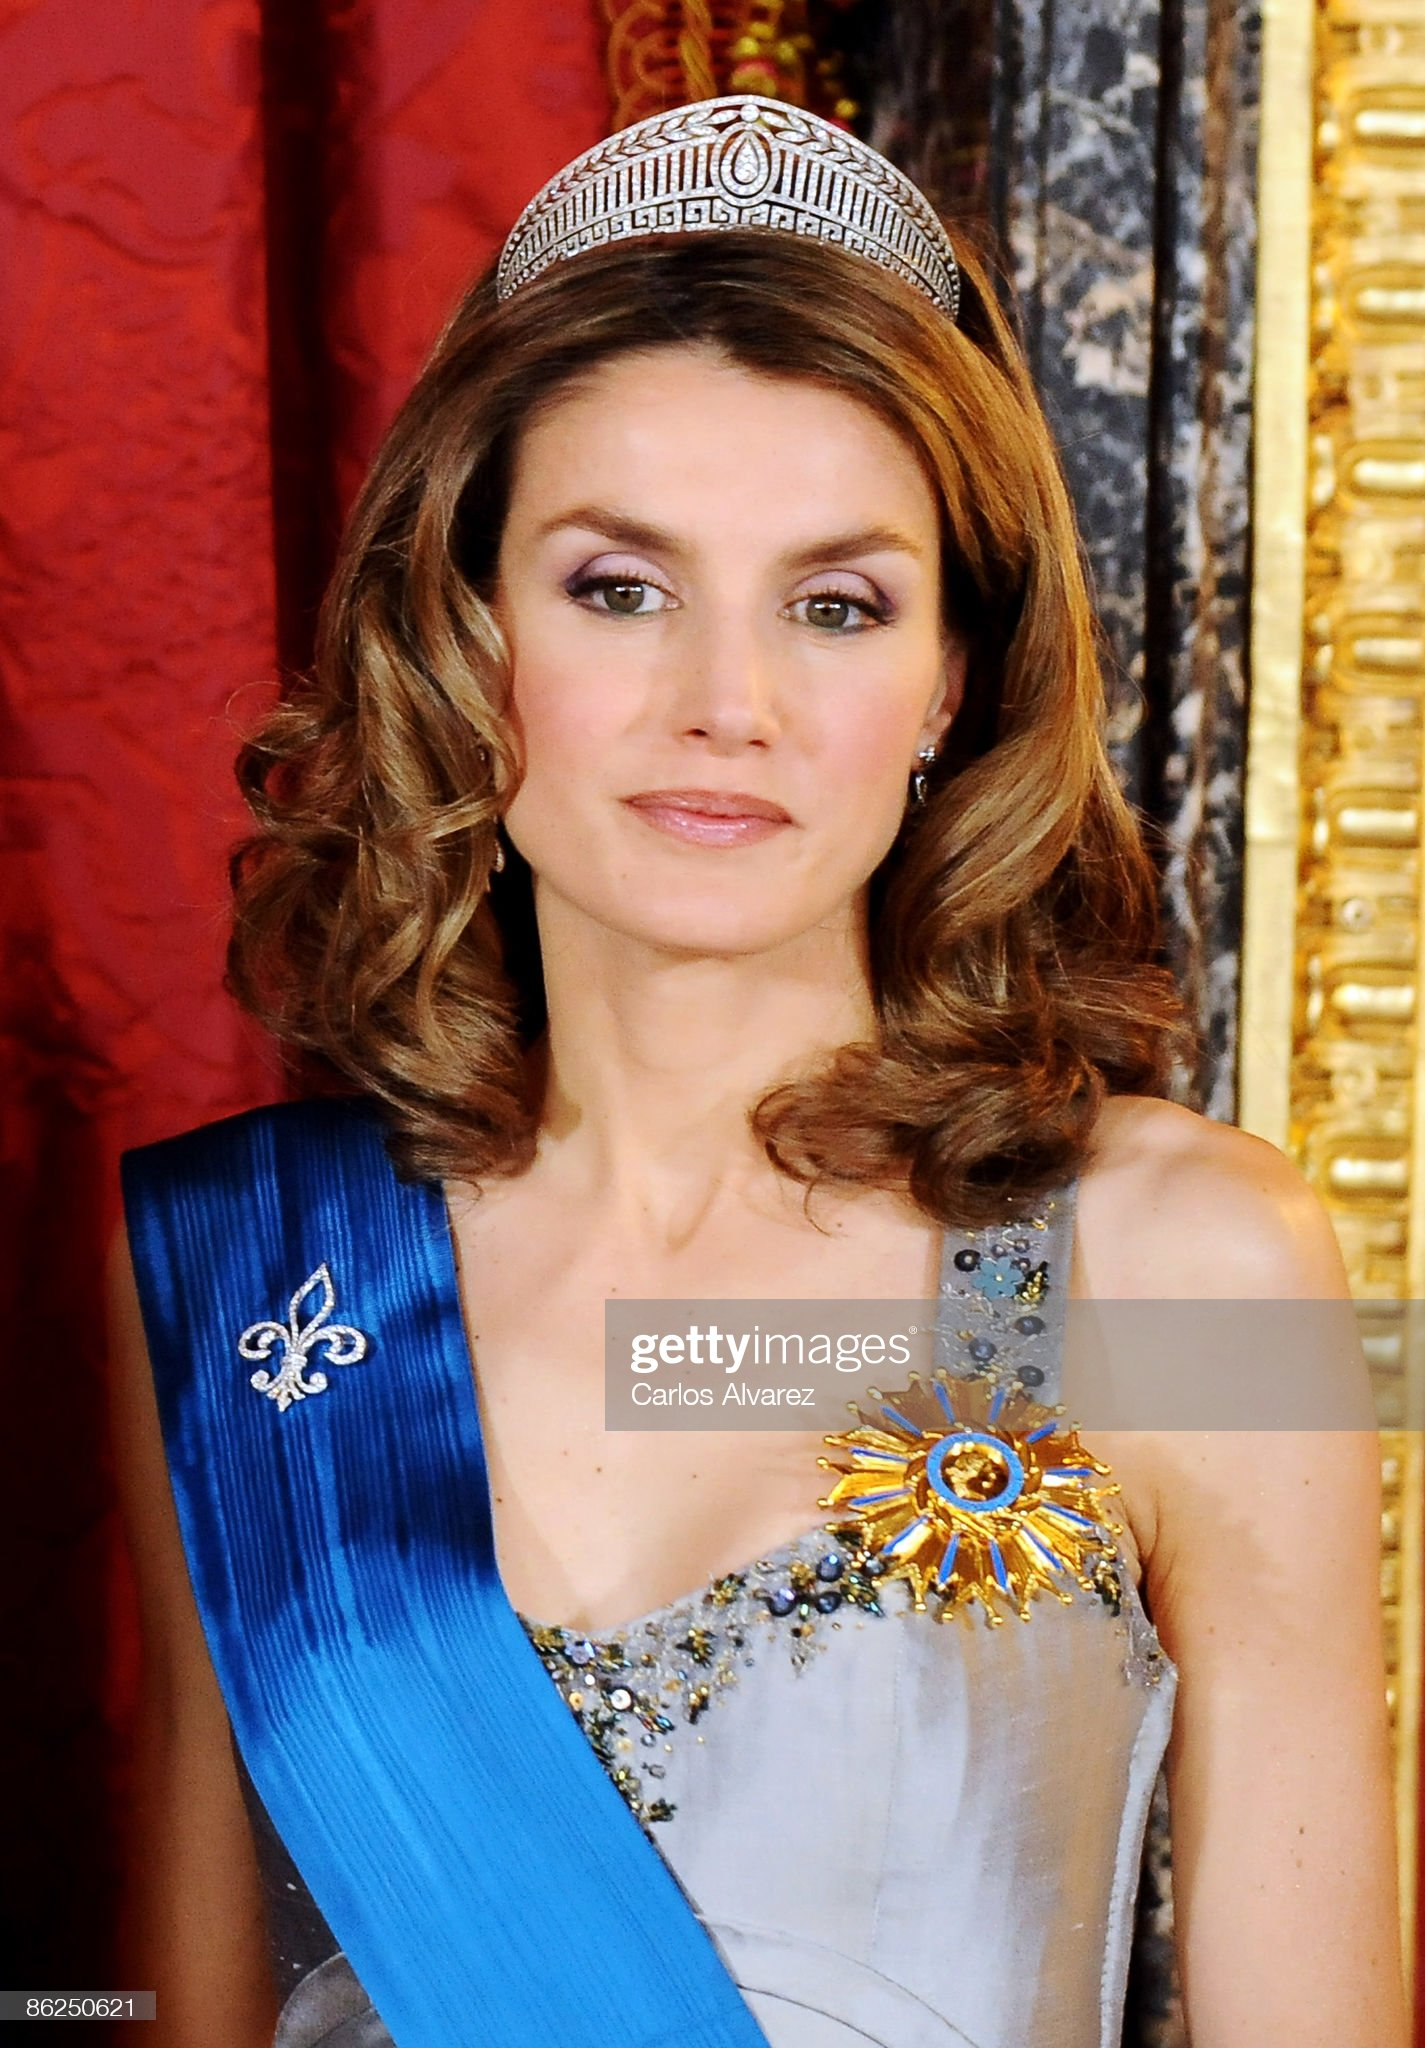 Вечерние наряды Королевы Летиции Spanish Royals Host Gala Dinner Honouring Nicolas Sarkozy & Carla Bruni : News Photo